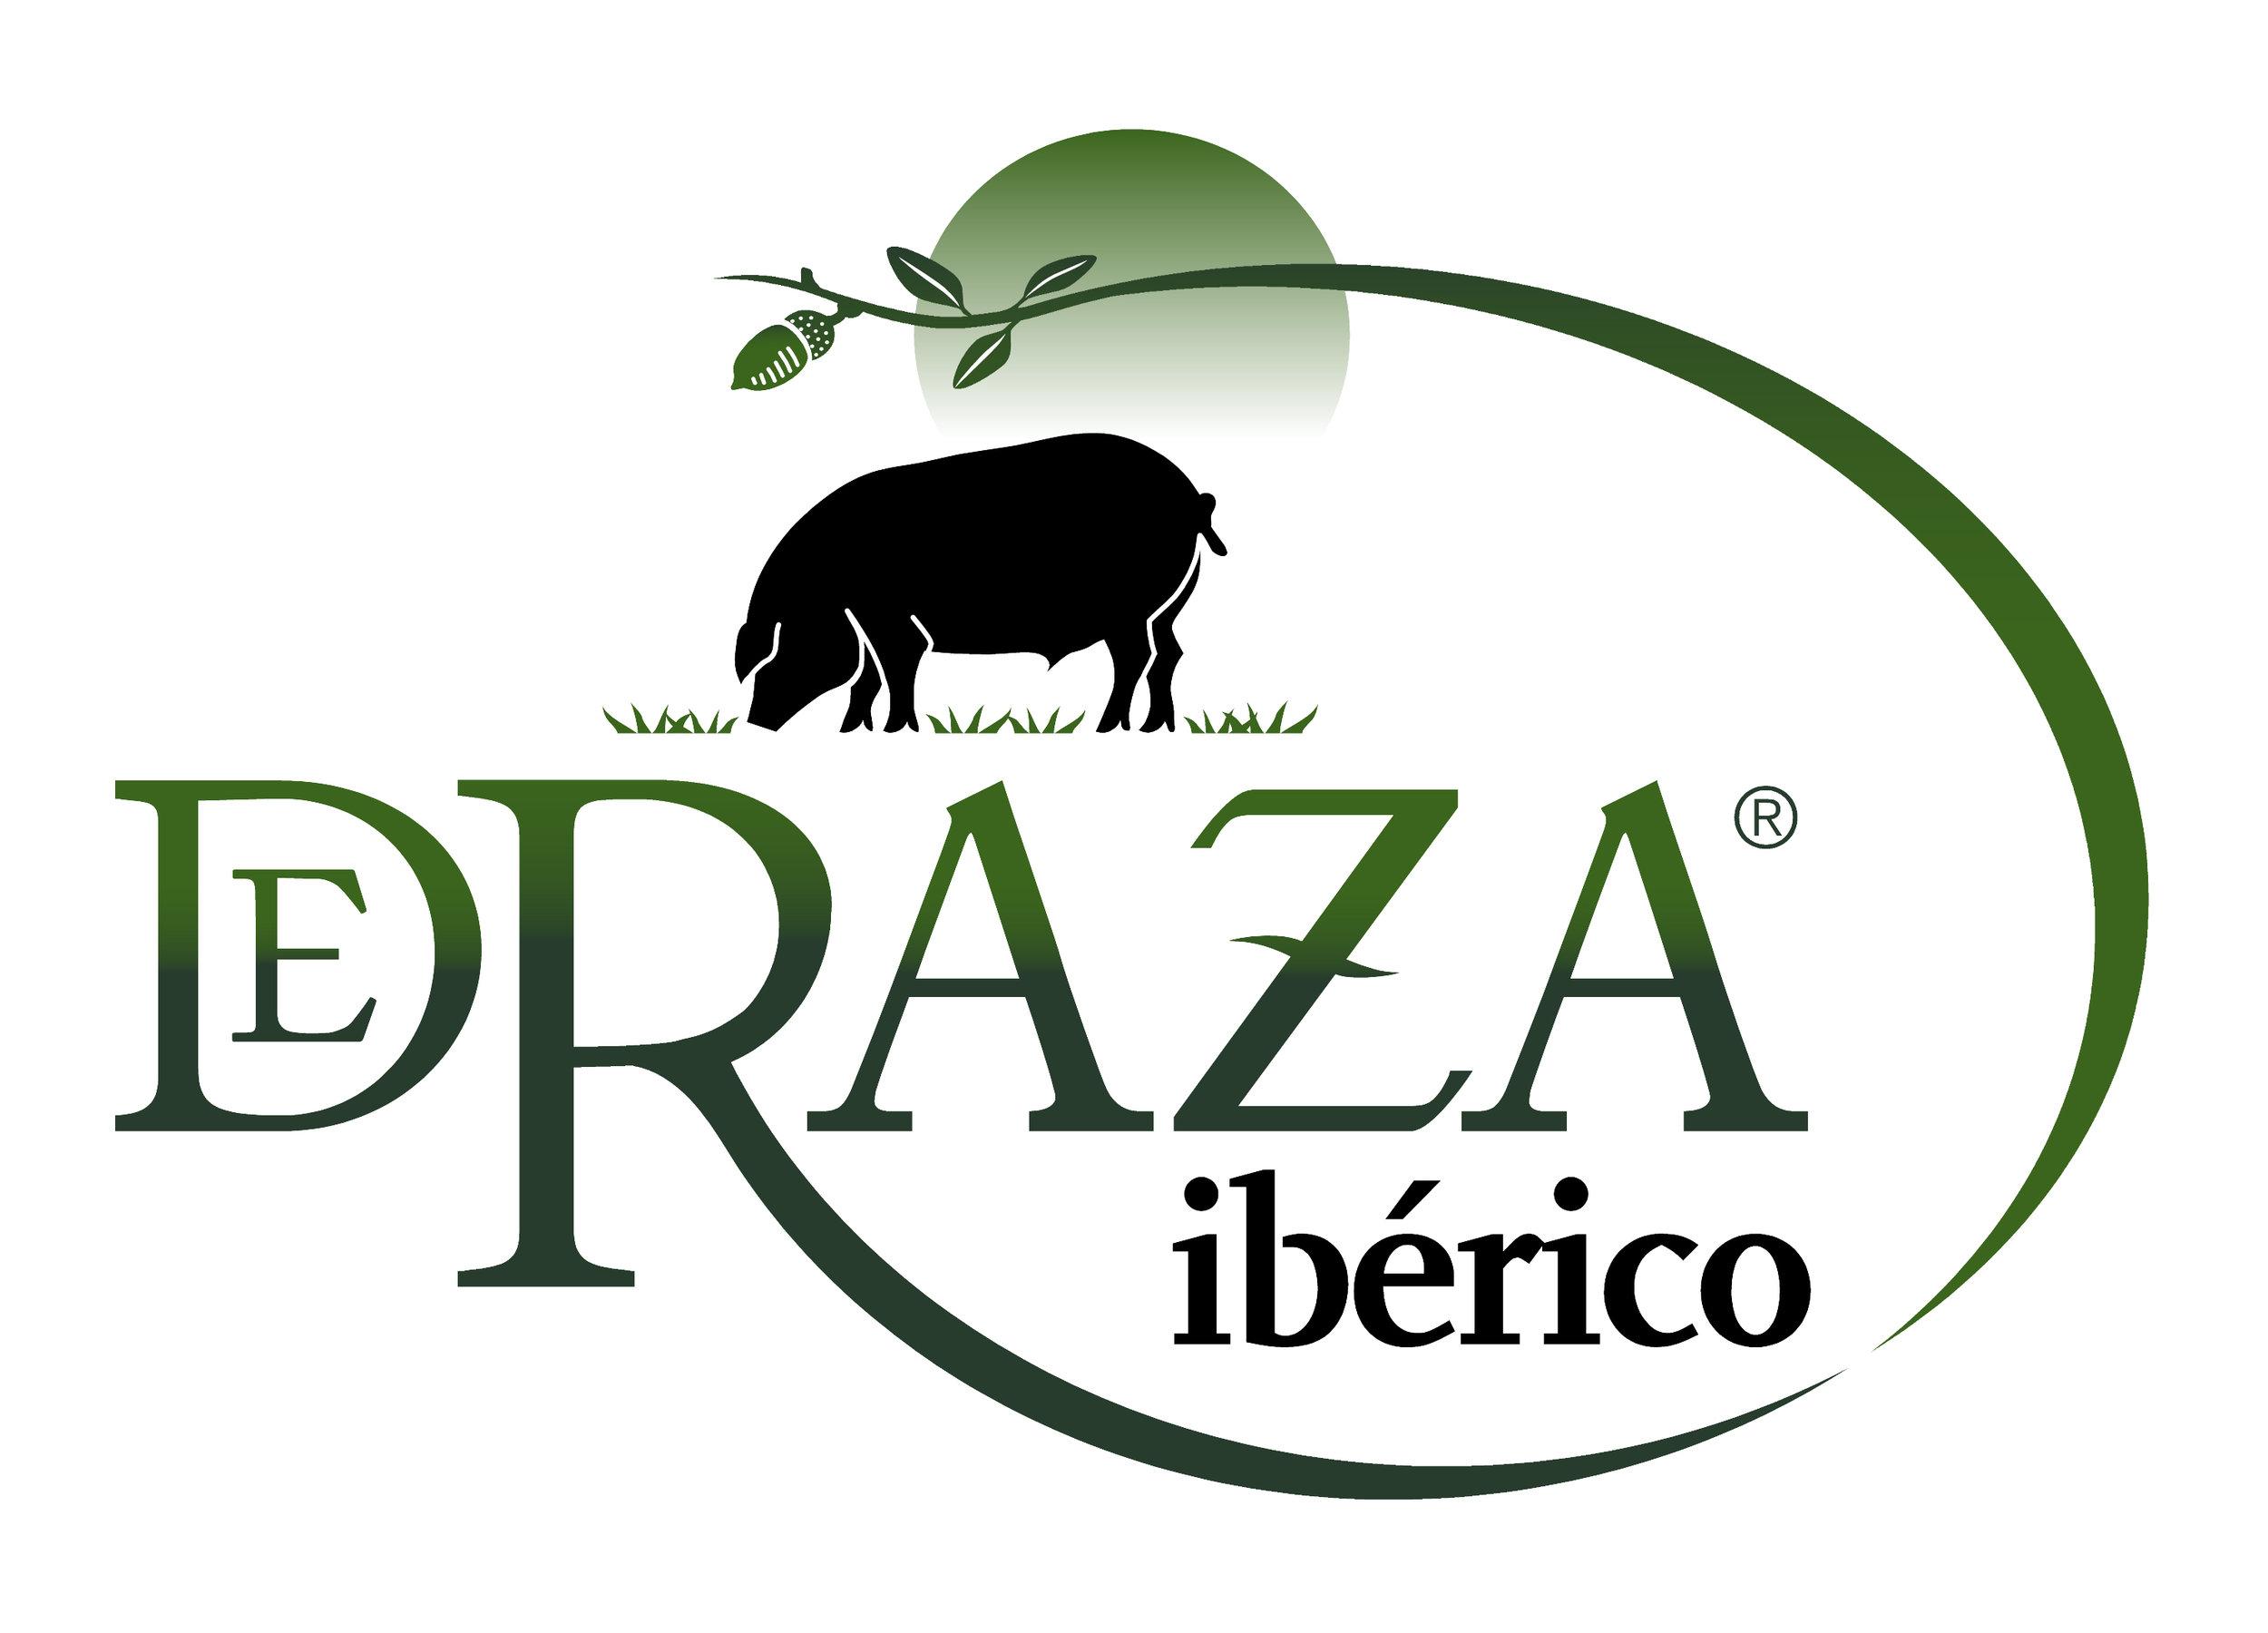 Deraza Logo.jpg